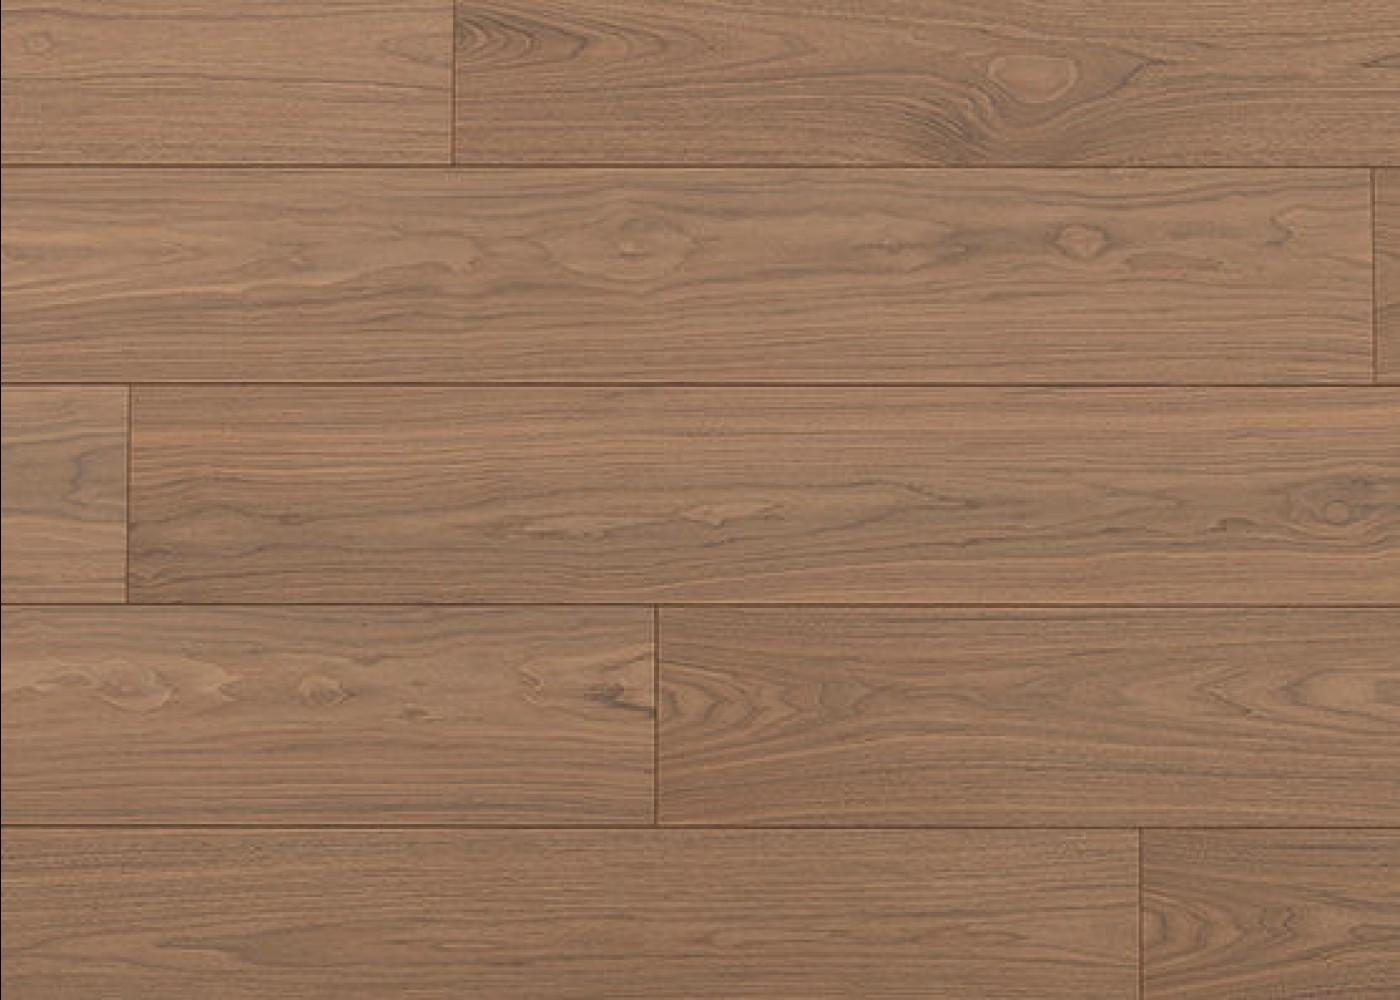 Sol plaqué bois Noyer Alaska brossé vernis extra-mat - Summit - Select 10x233x2050